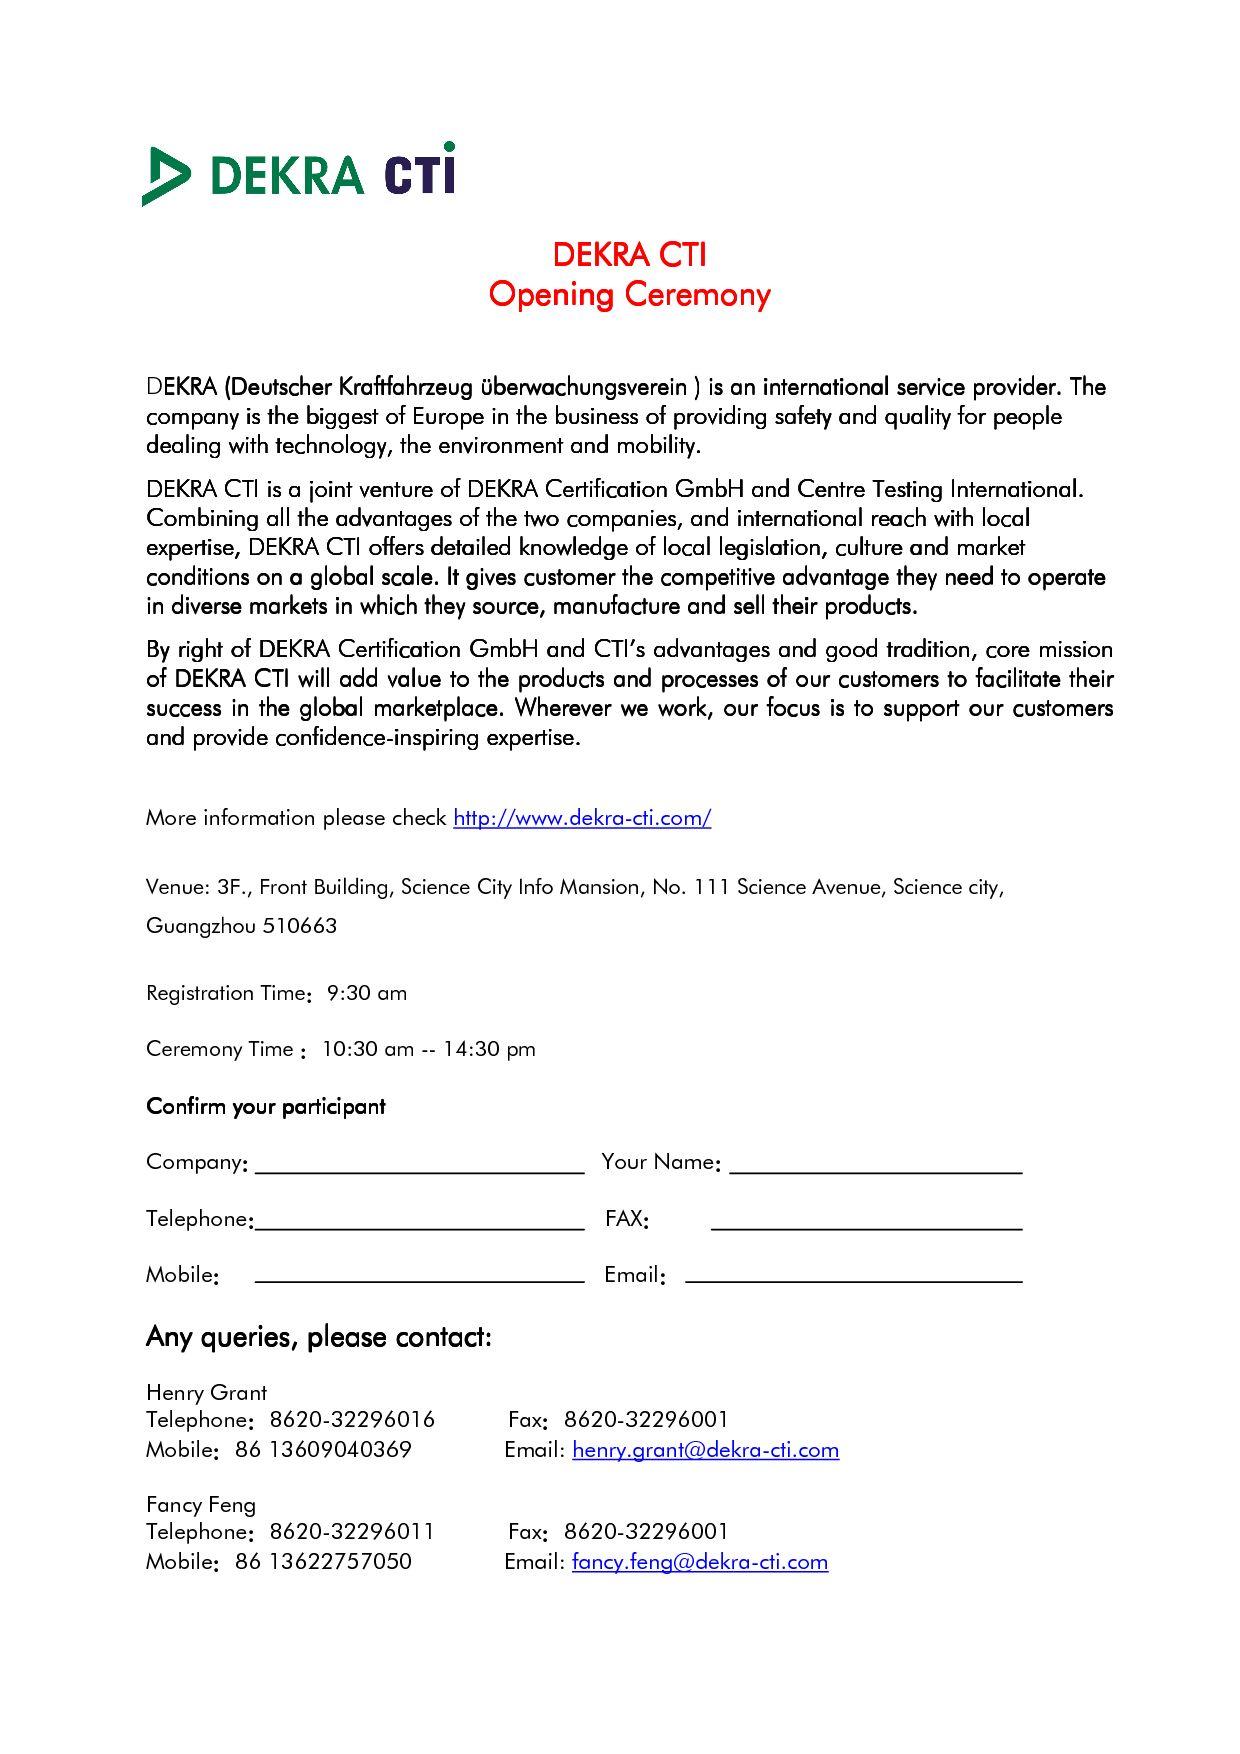 Invitation Letter To Grand Opening Ceremony Invitation